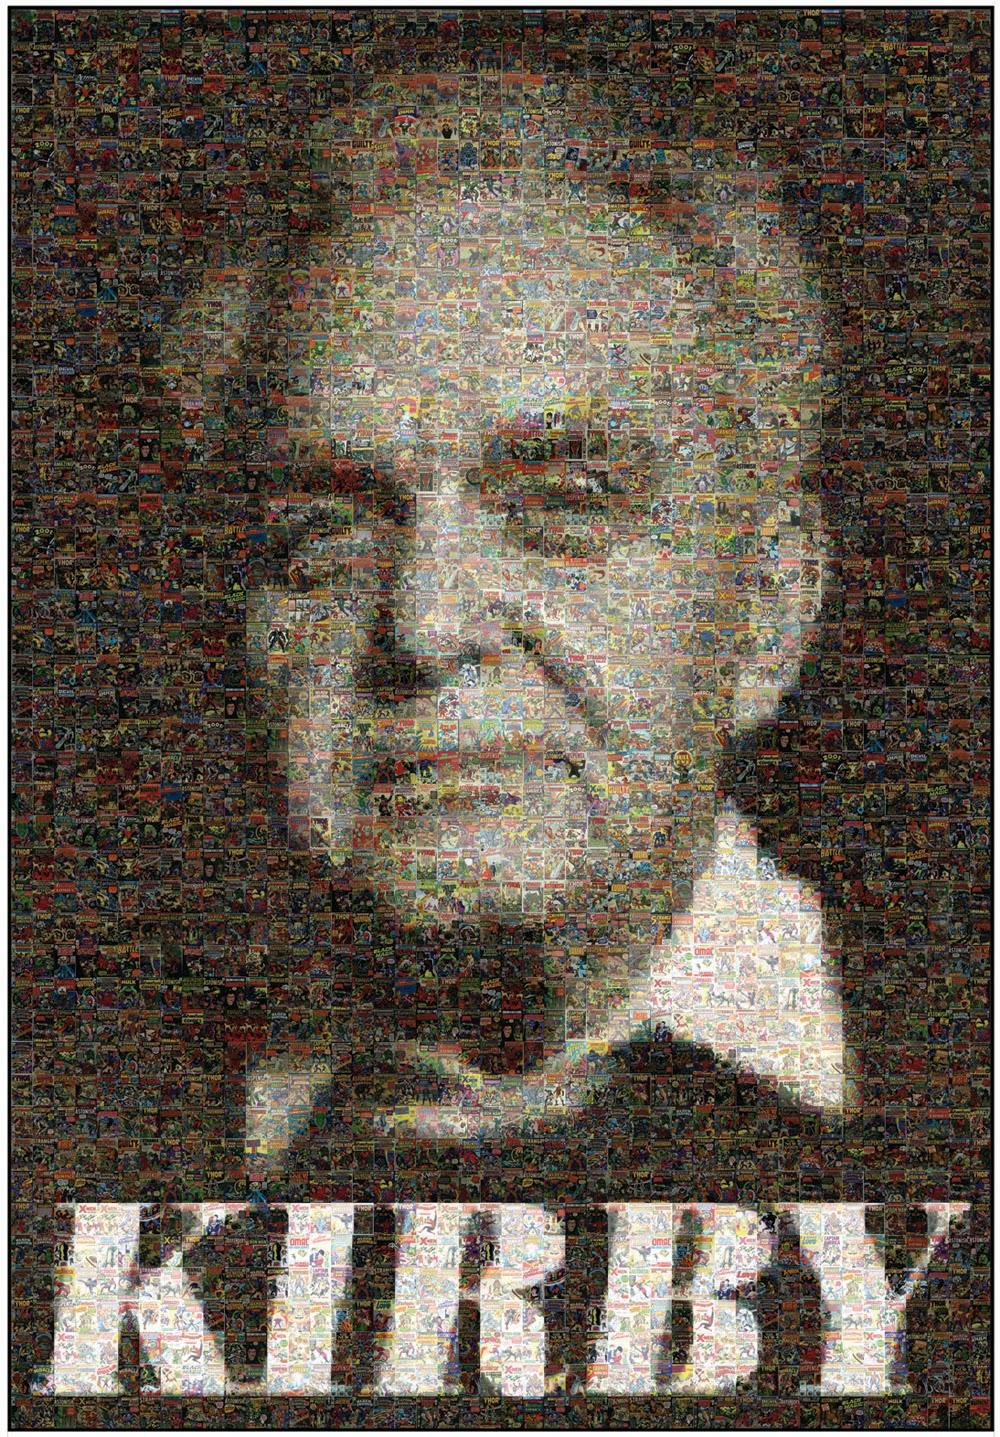 Jack Kirby compostire portrait